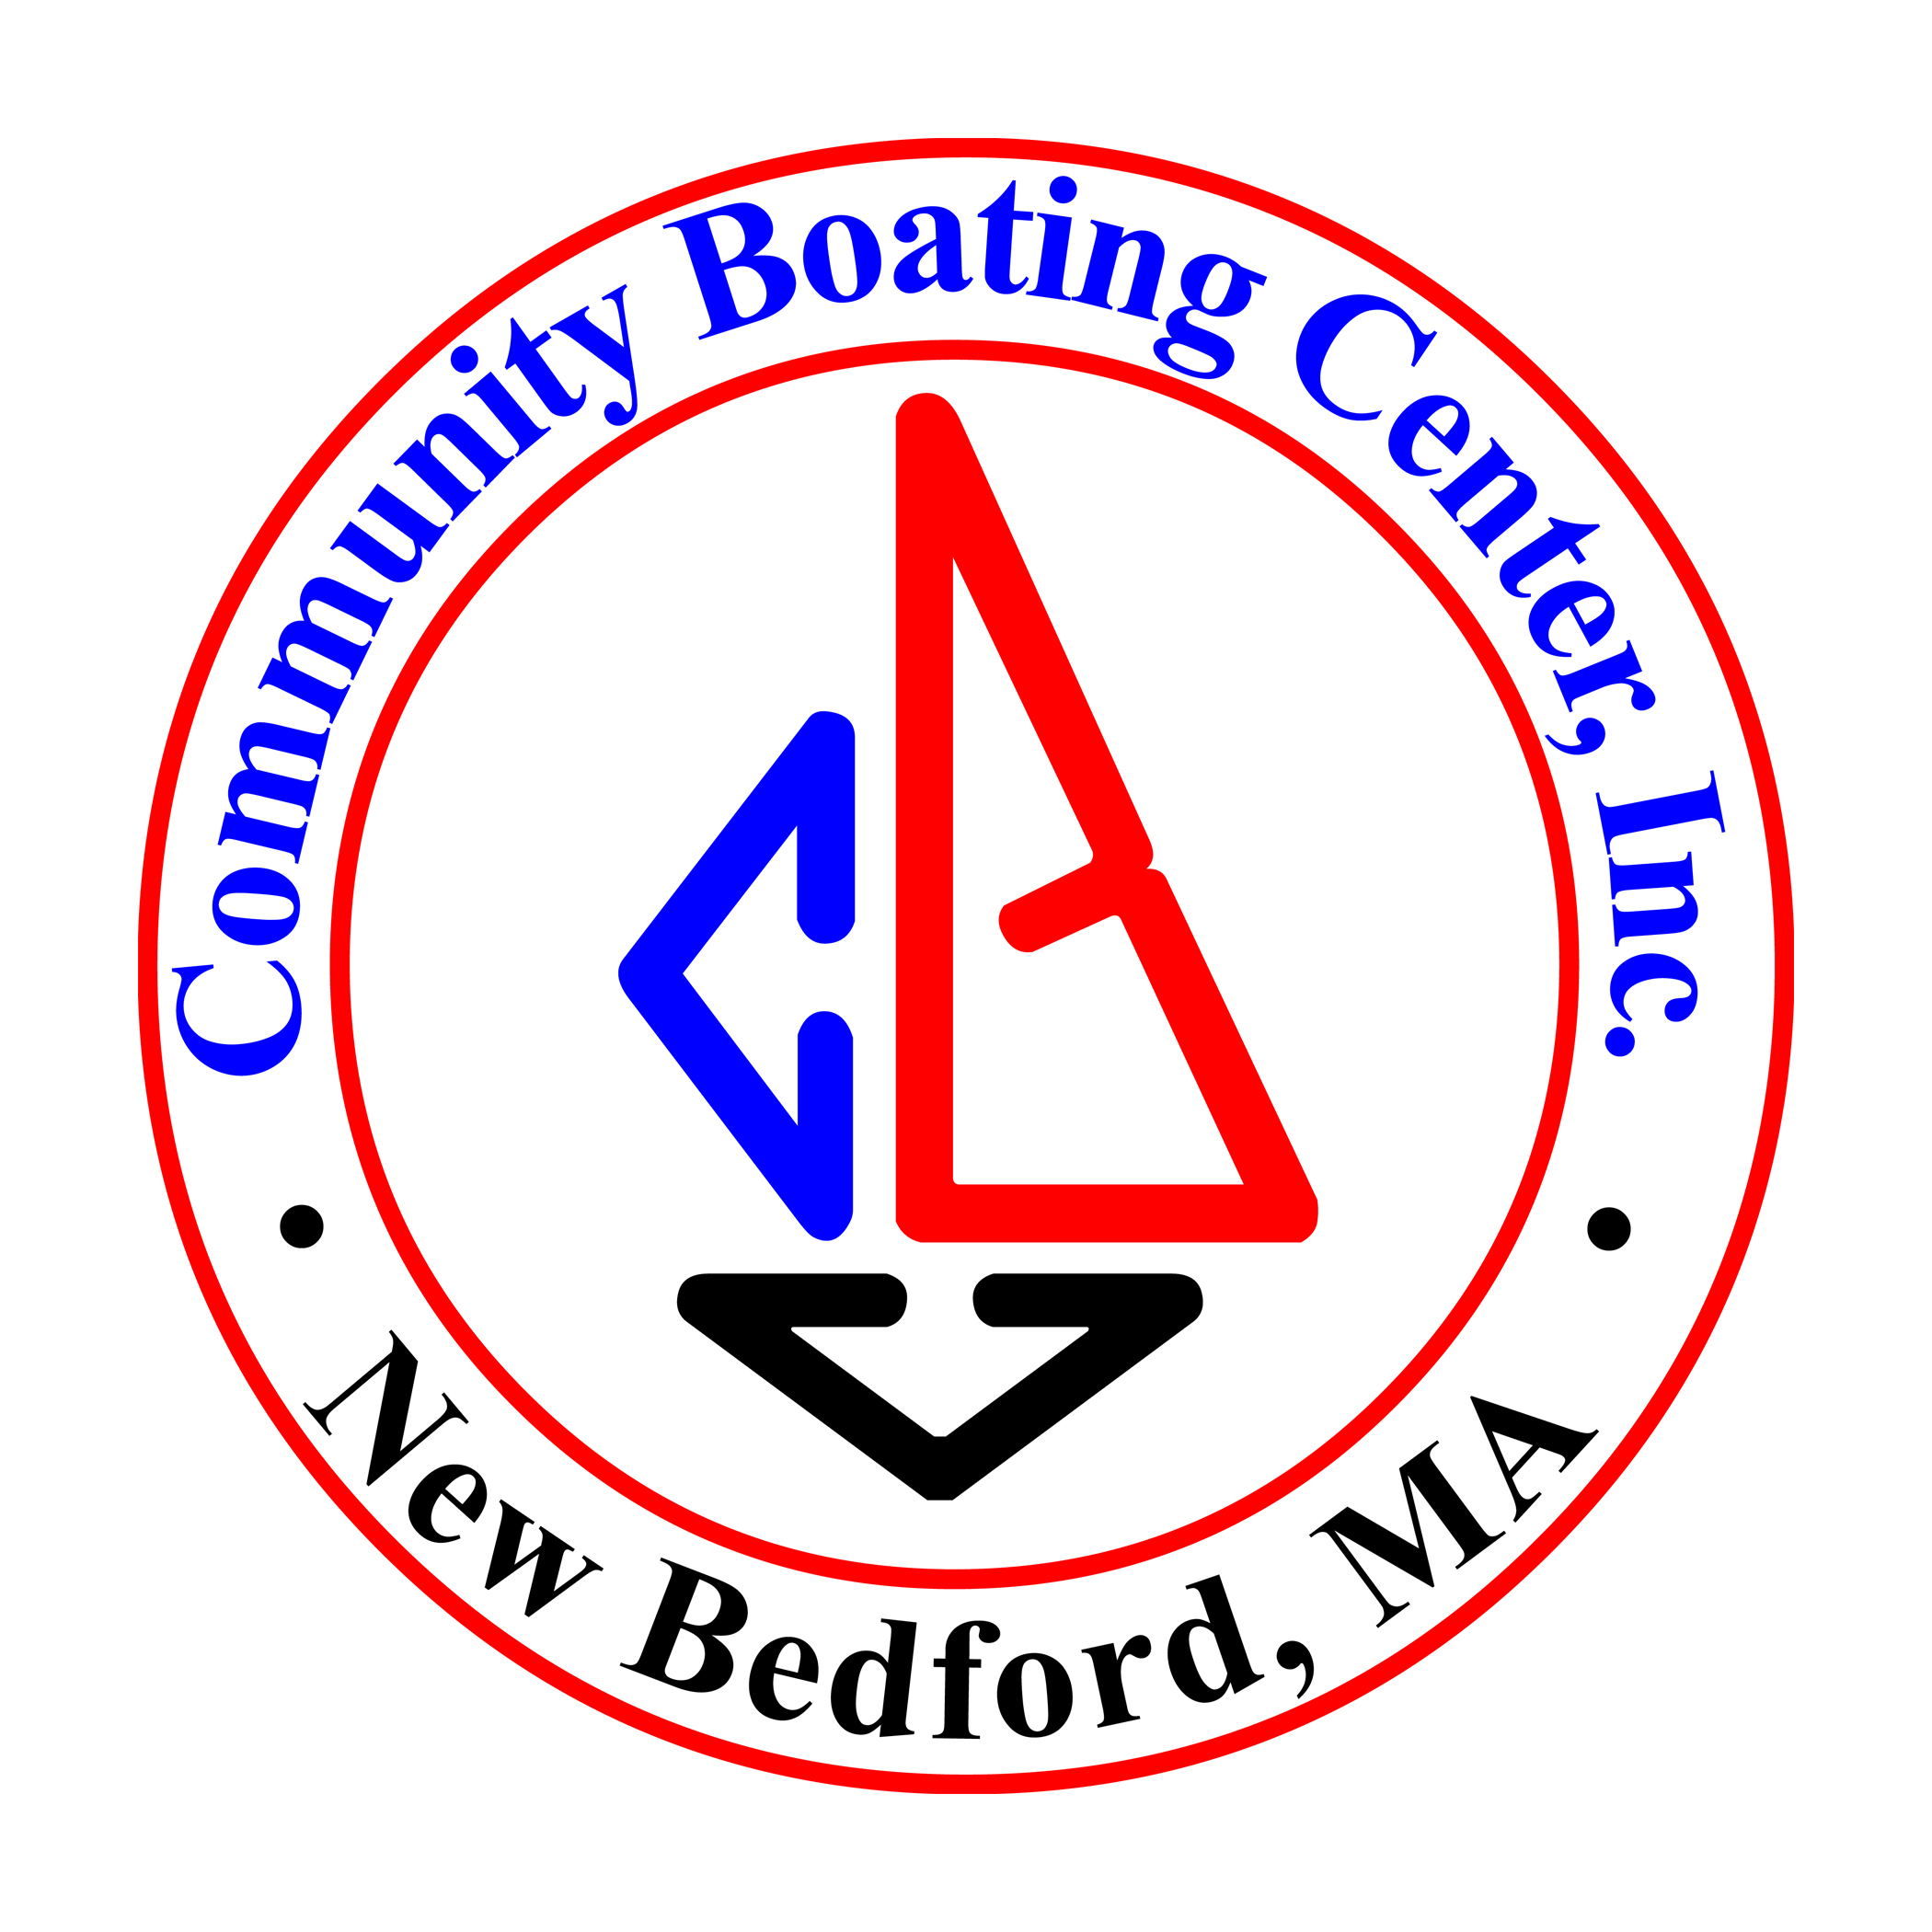 Community Boating Center, Inc.